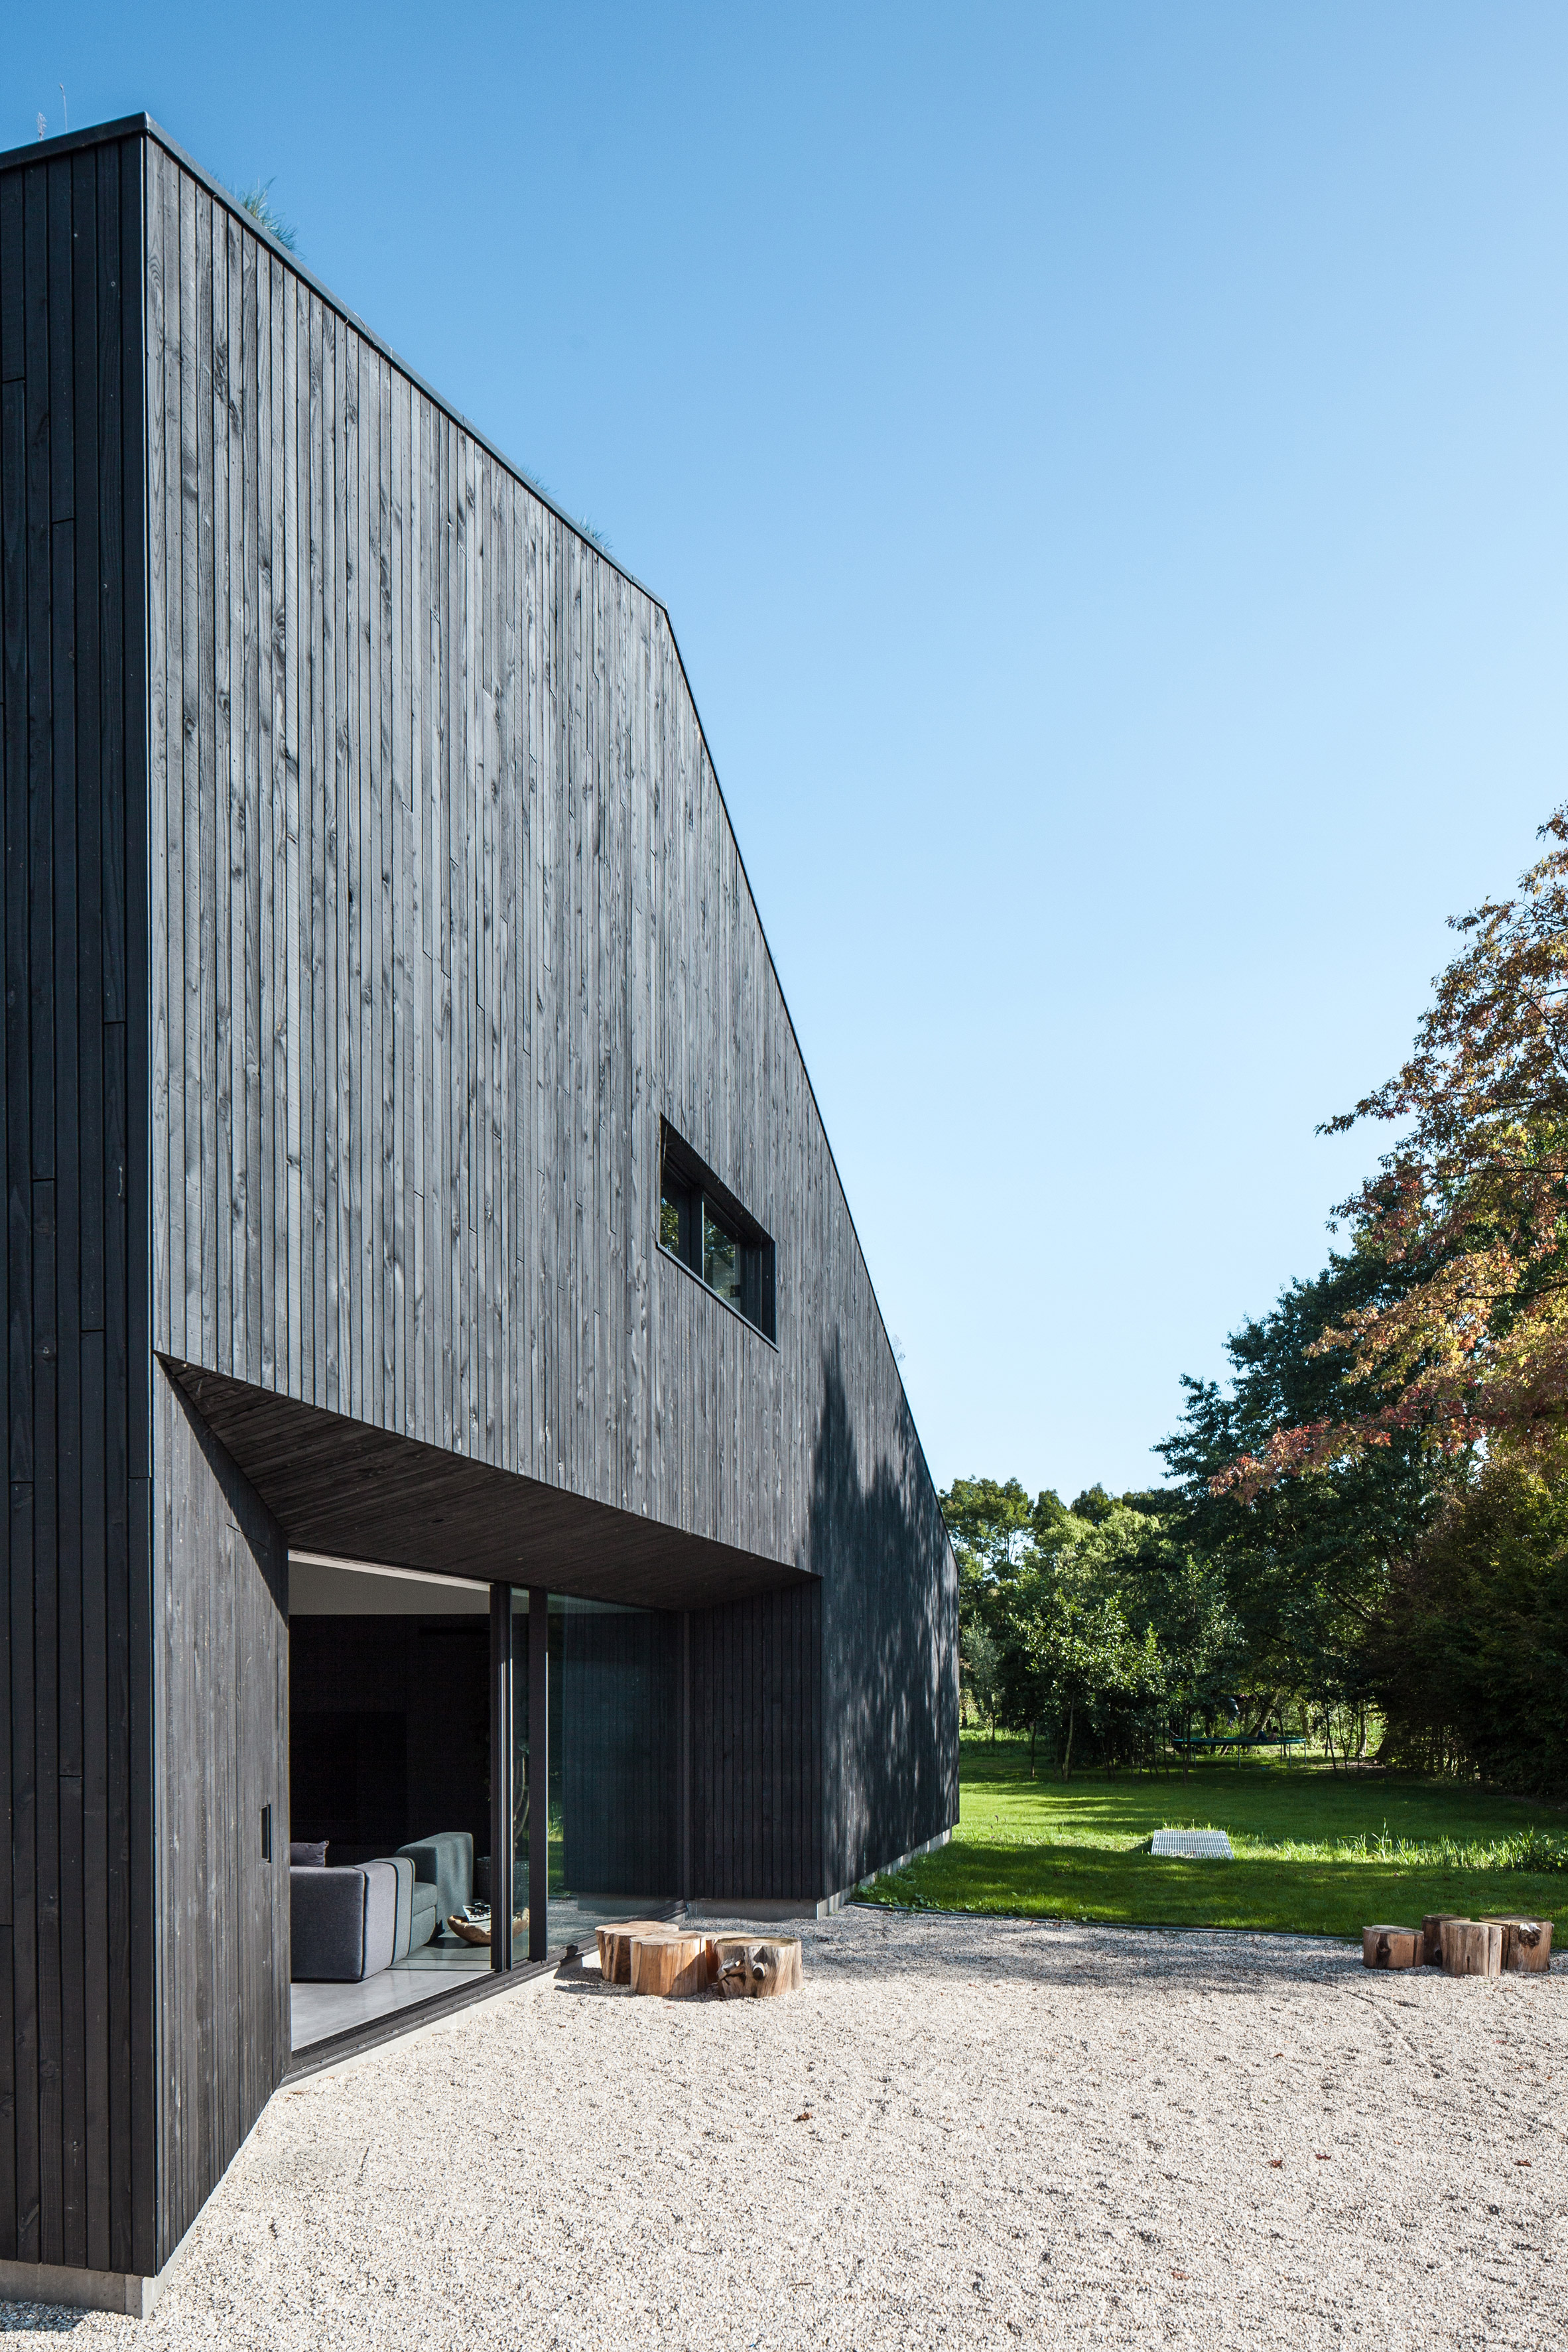 villa-SG21-fillieverhoeven-architects-residential-architecture_dezeen_2364_col_16